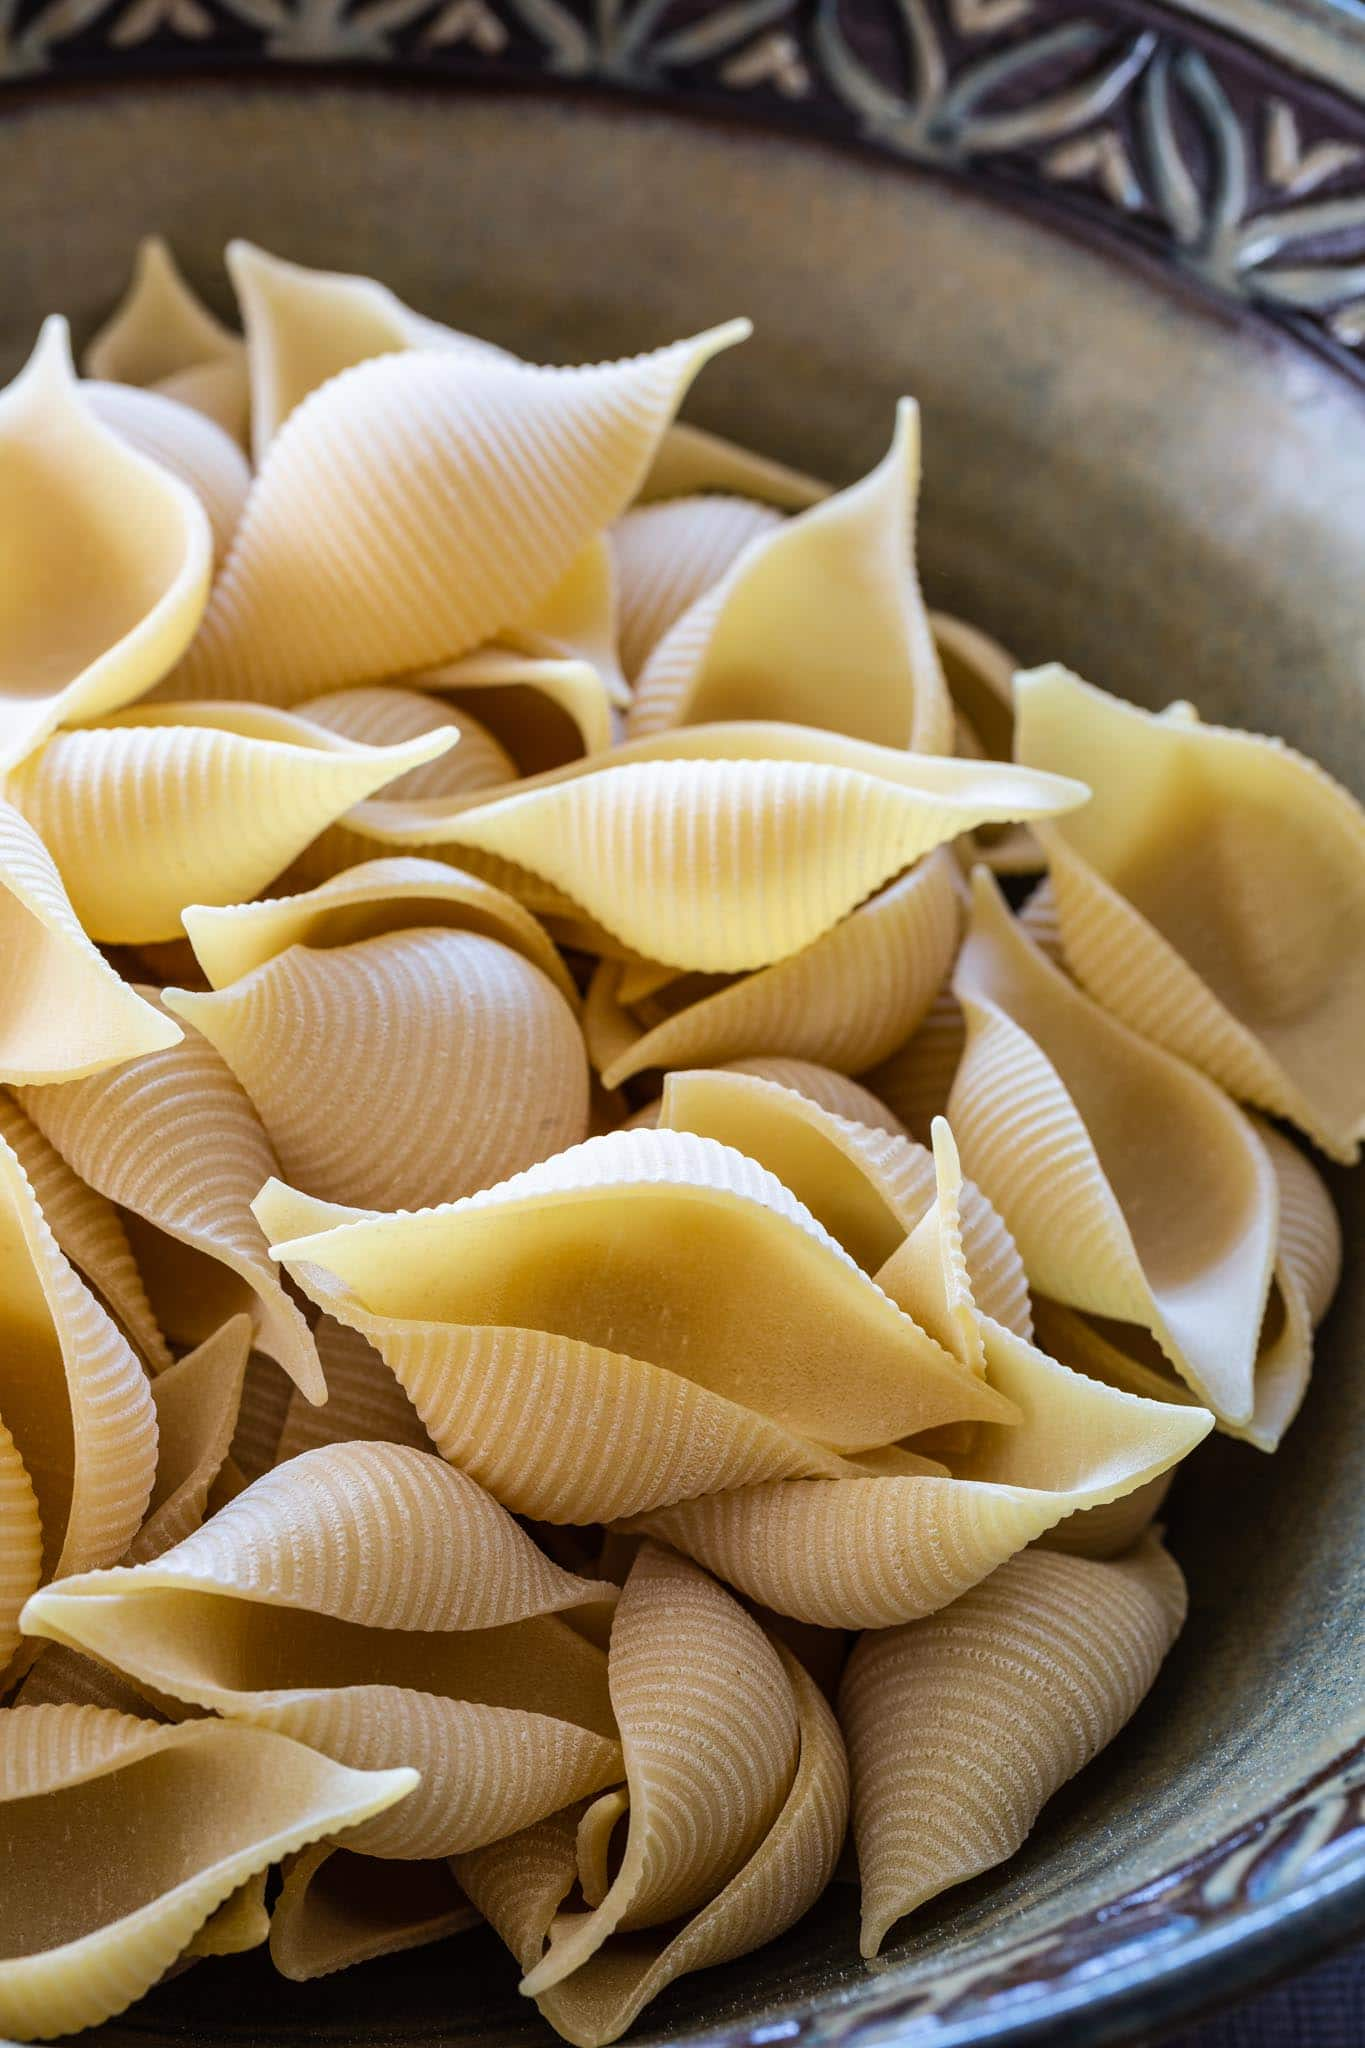 Conchiglioni pasta shells.